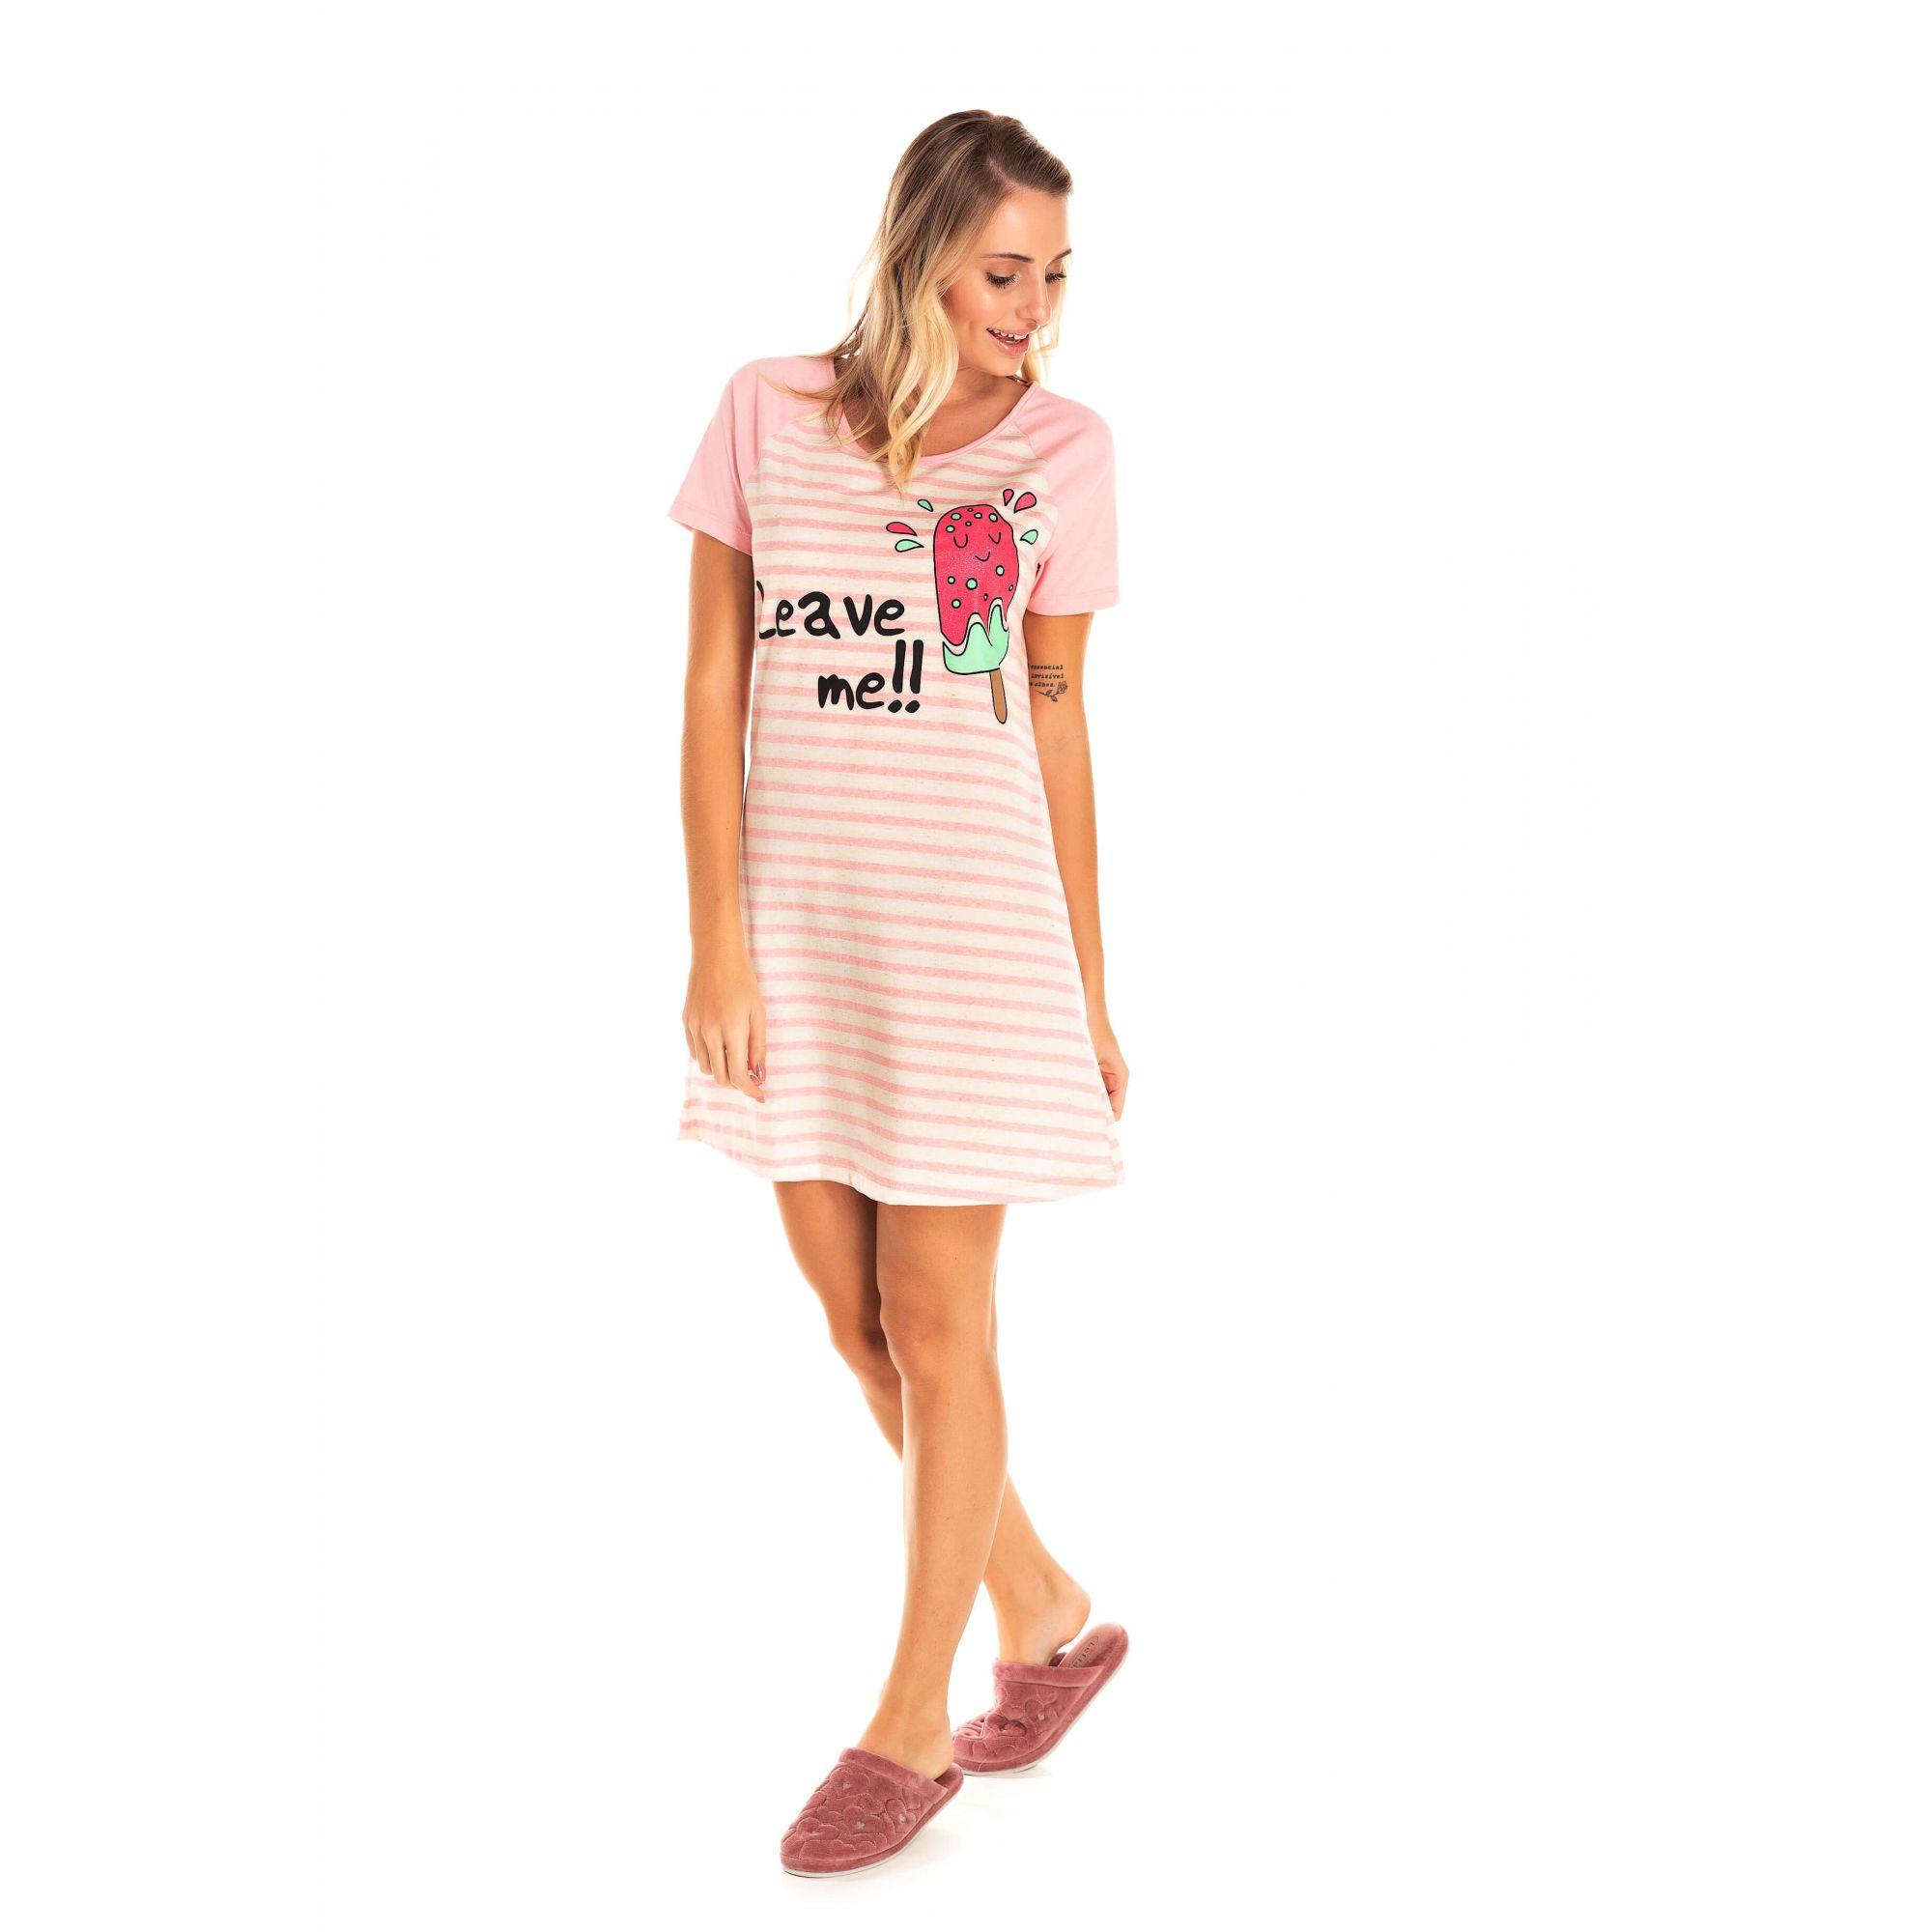 039 - Camisola Adulto Feminino Picolé - Rosa